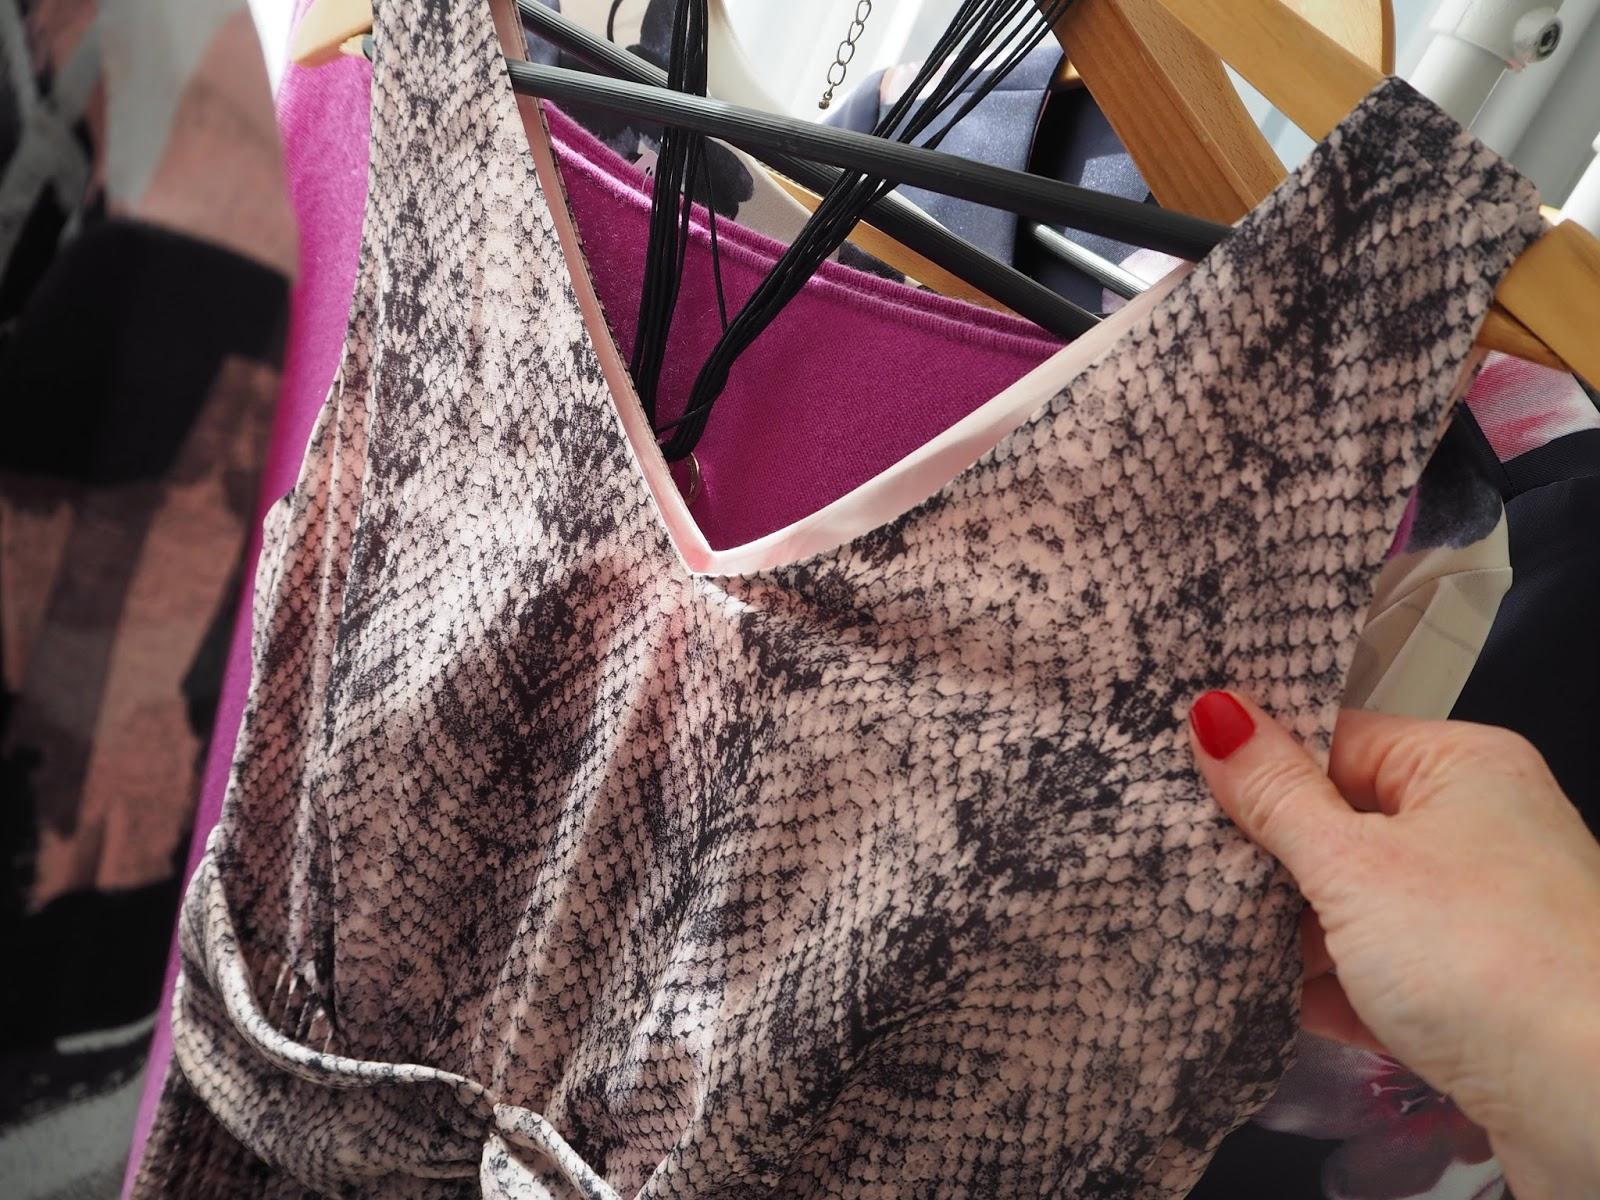 What-Lizzy-Loves-Kaleidoscope-AW17-Press-Day-Snakeprint-maxi-dress-detail